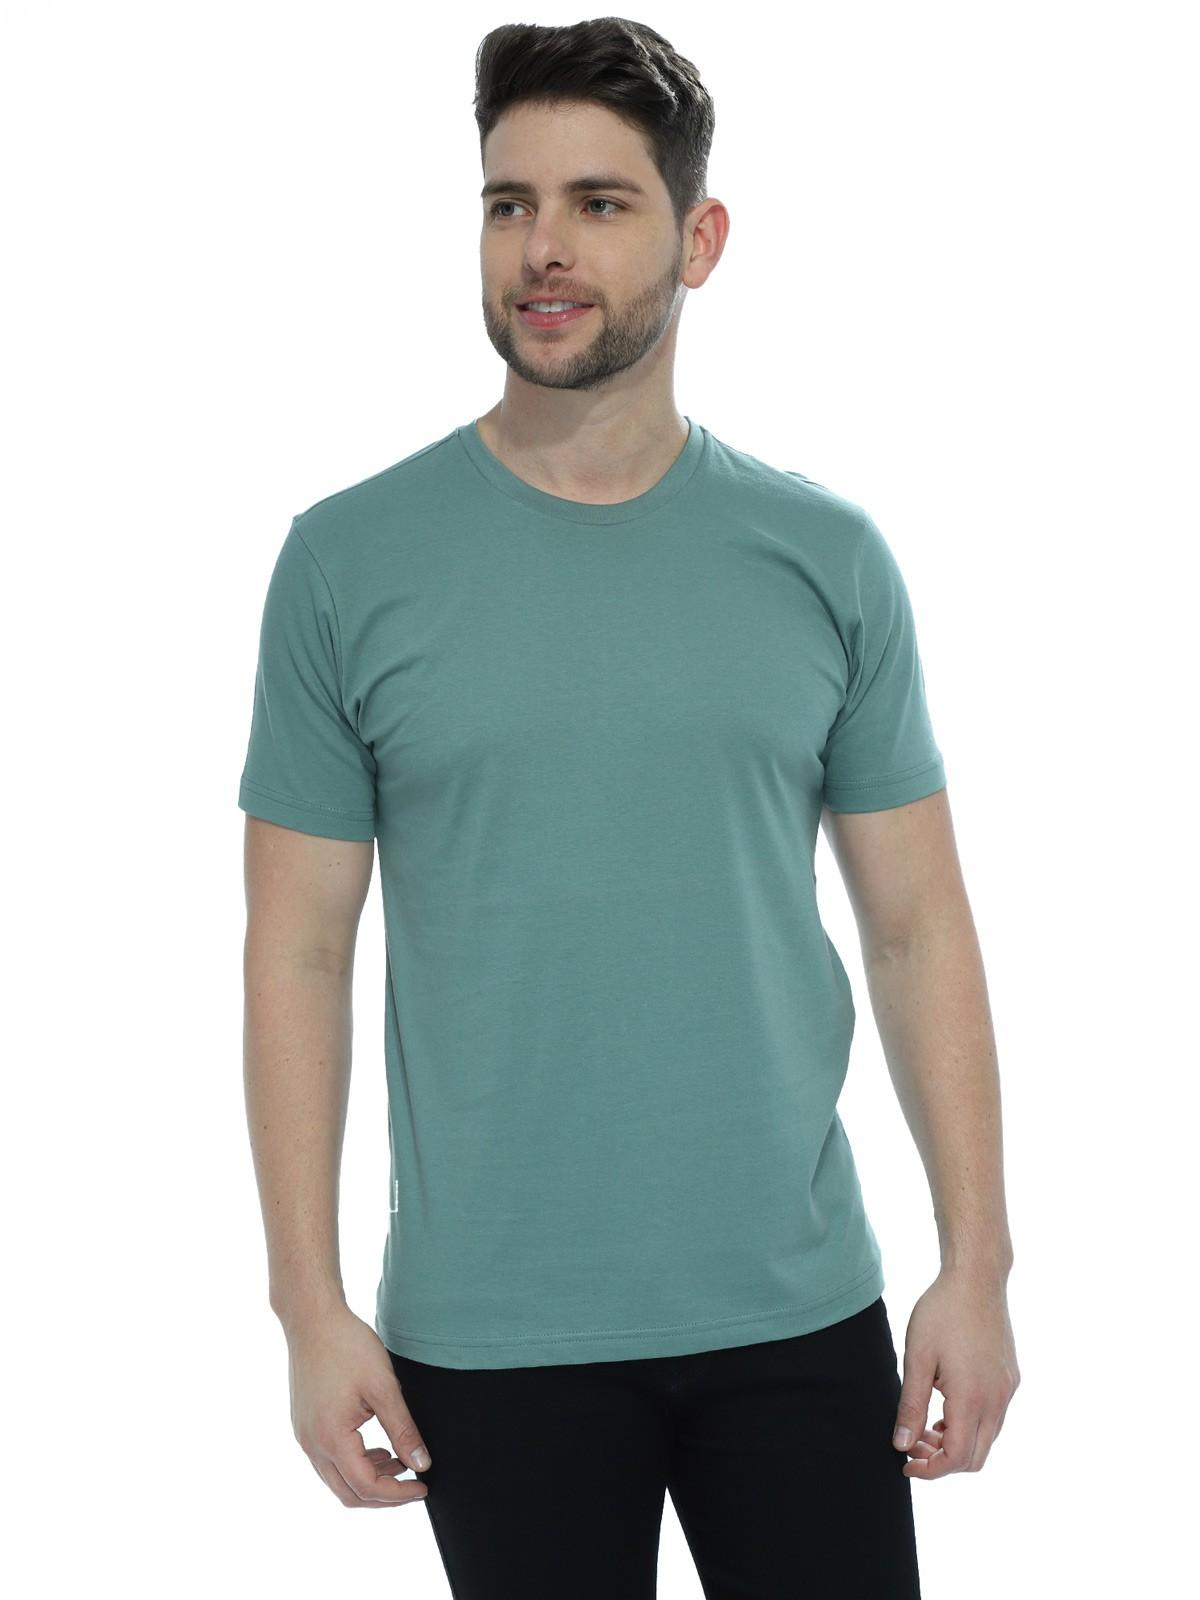 Camiseta Masculina Básica Lisa Concreto